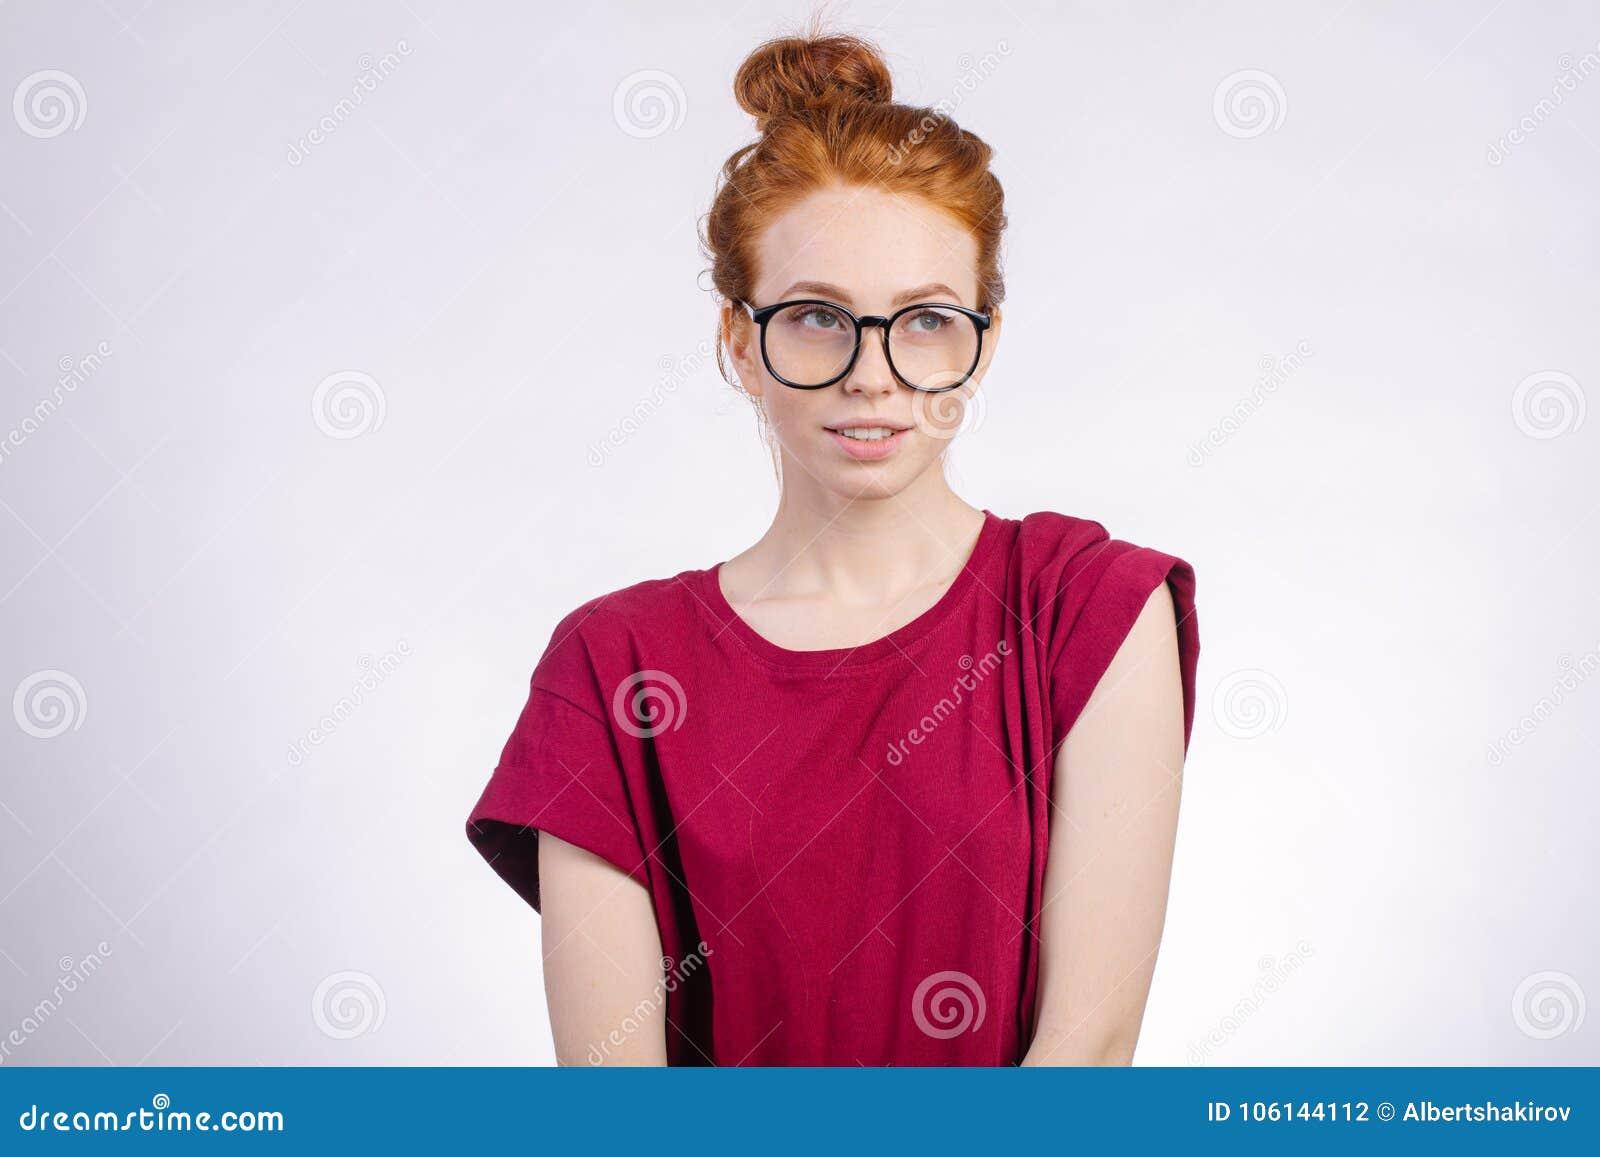 Cute redhead wearing glasses